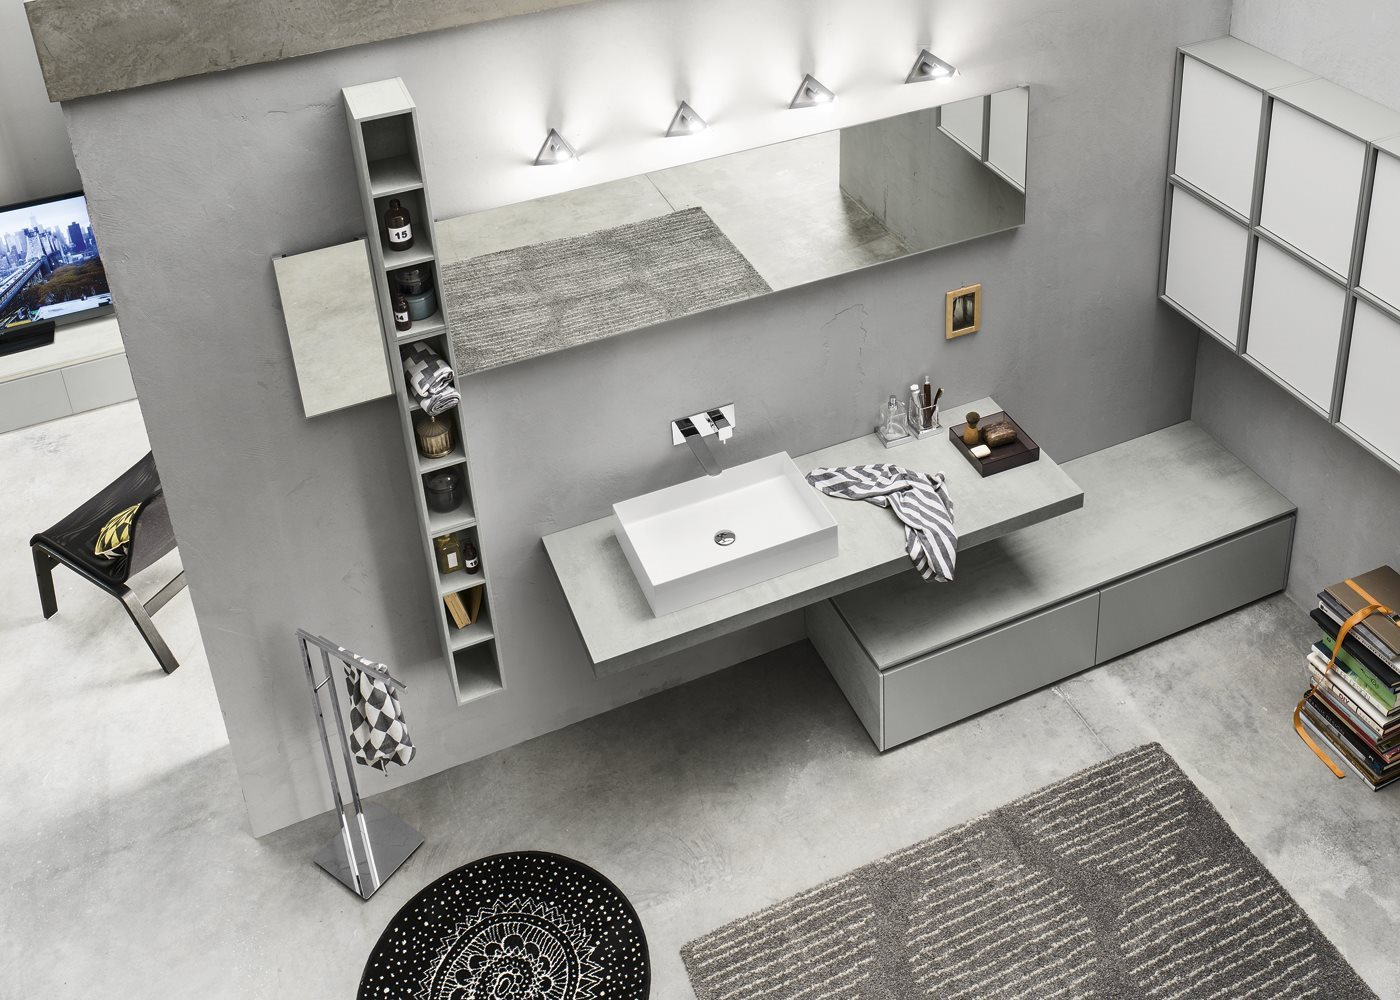 Meuble pour salle de bain meuble sous vasque progetto - Imitazioni mobili design ...